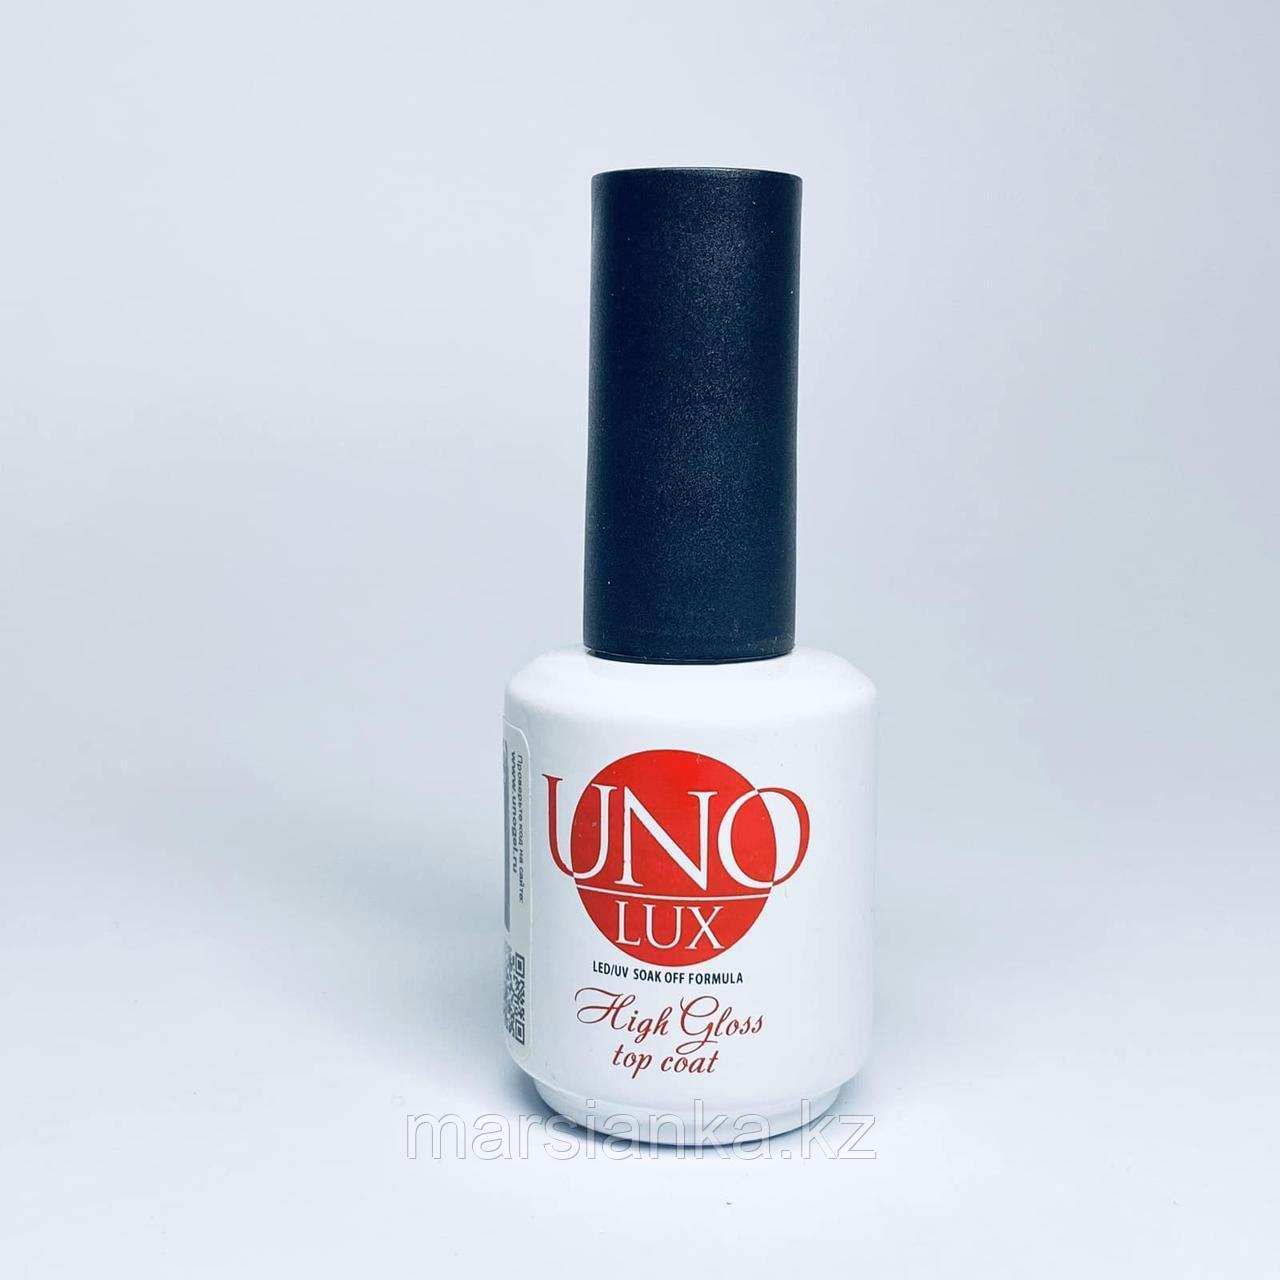 Top coat UNO, Lux high gloss, 15ml (топ)